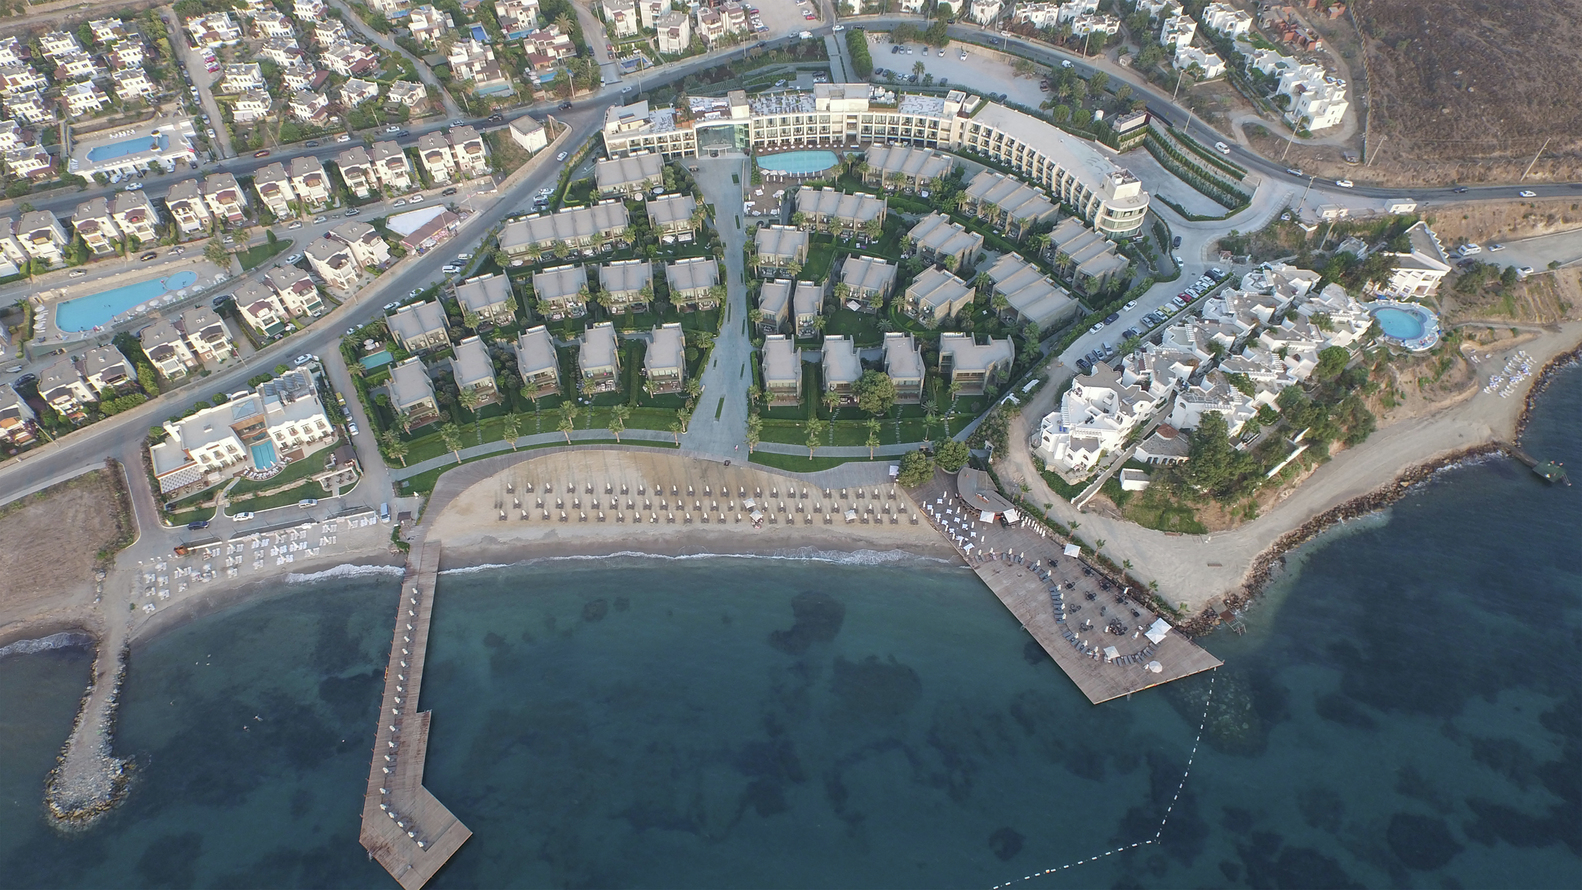 Swissotel Resort Bodrum Beach Gad & Gokhan